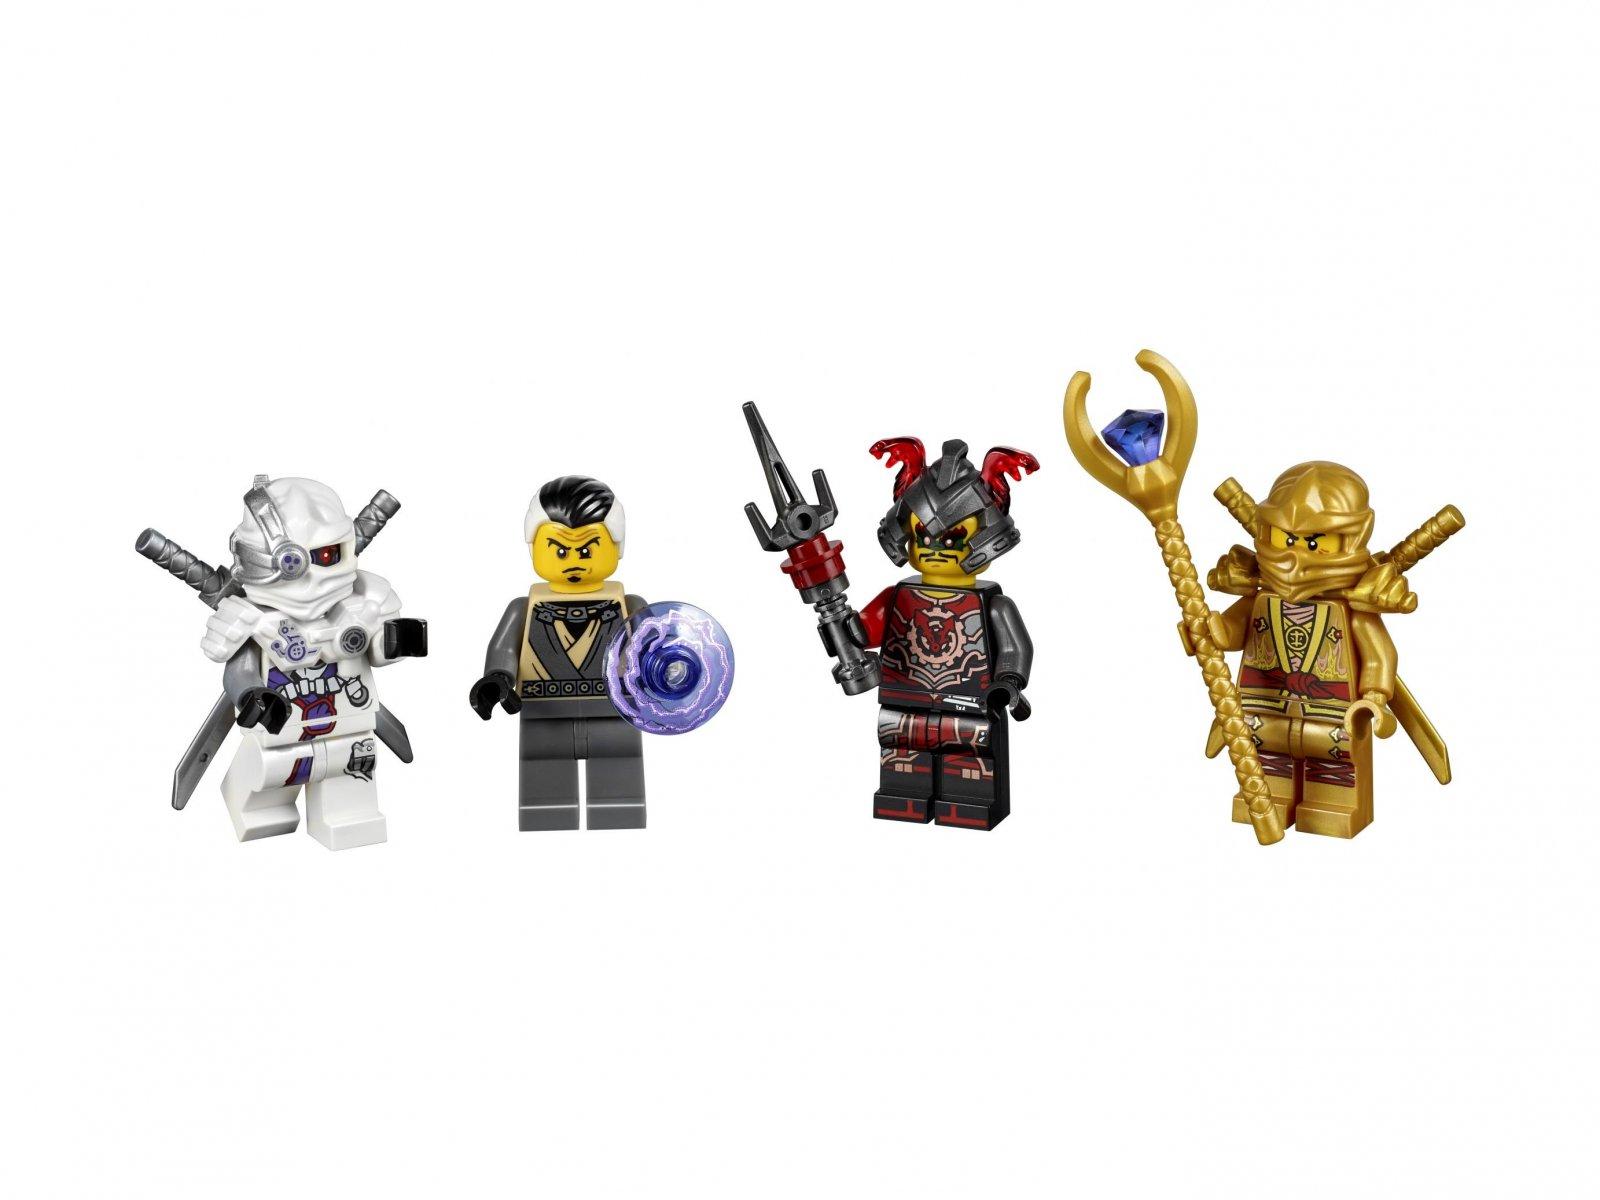 LEGO Ninjago® 5004938 Bricktober - zestaw minifigurek